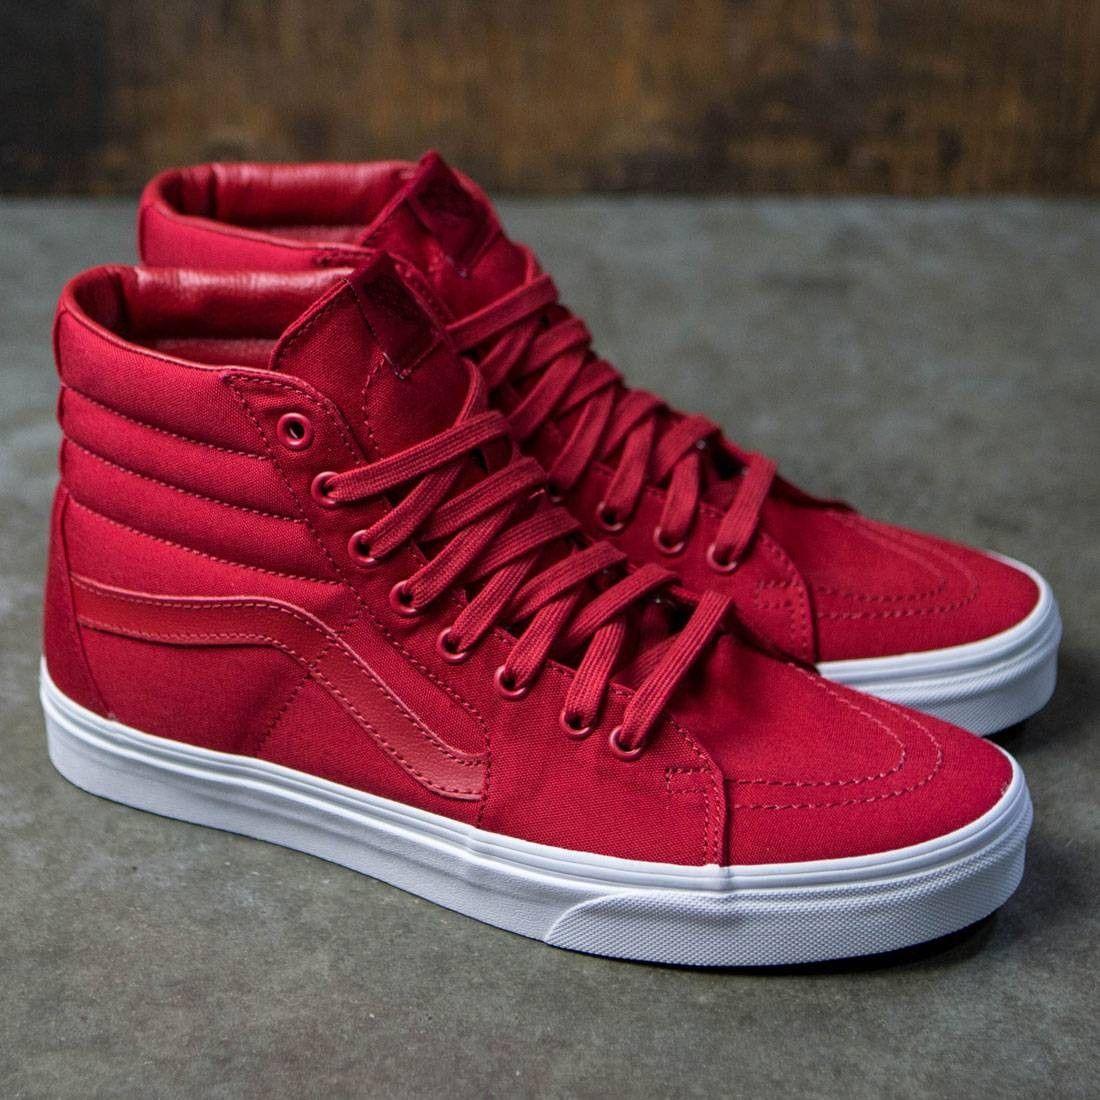 vans canvas red